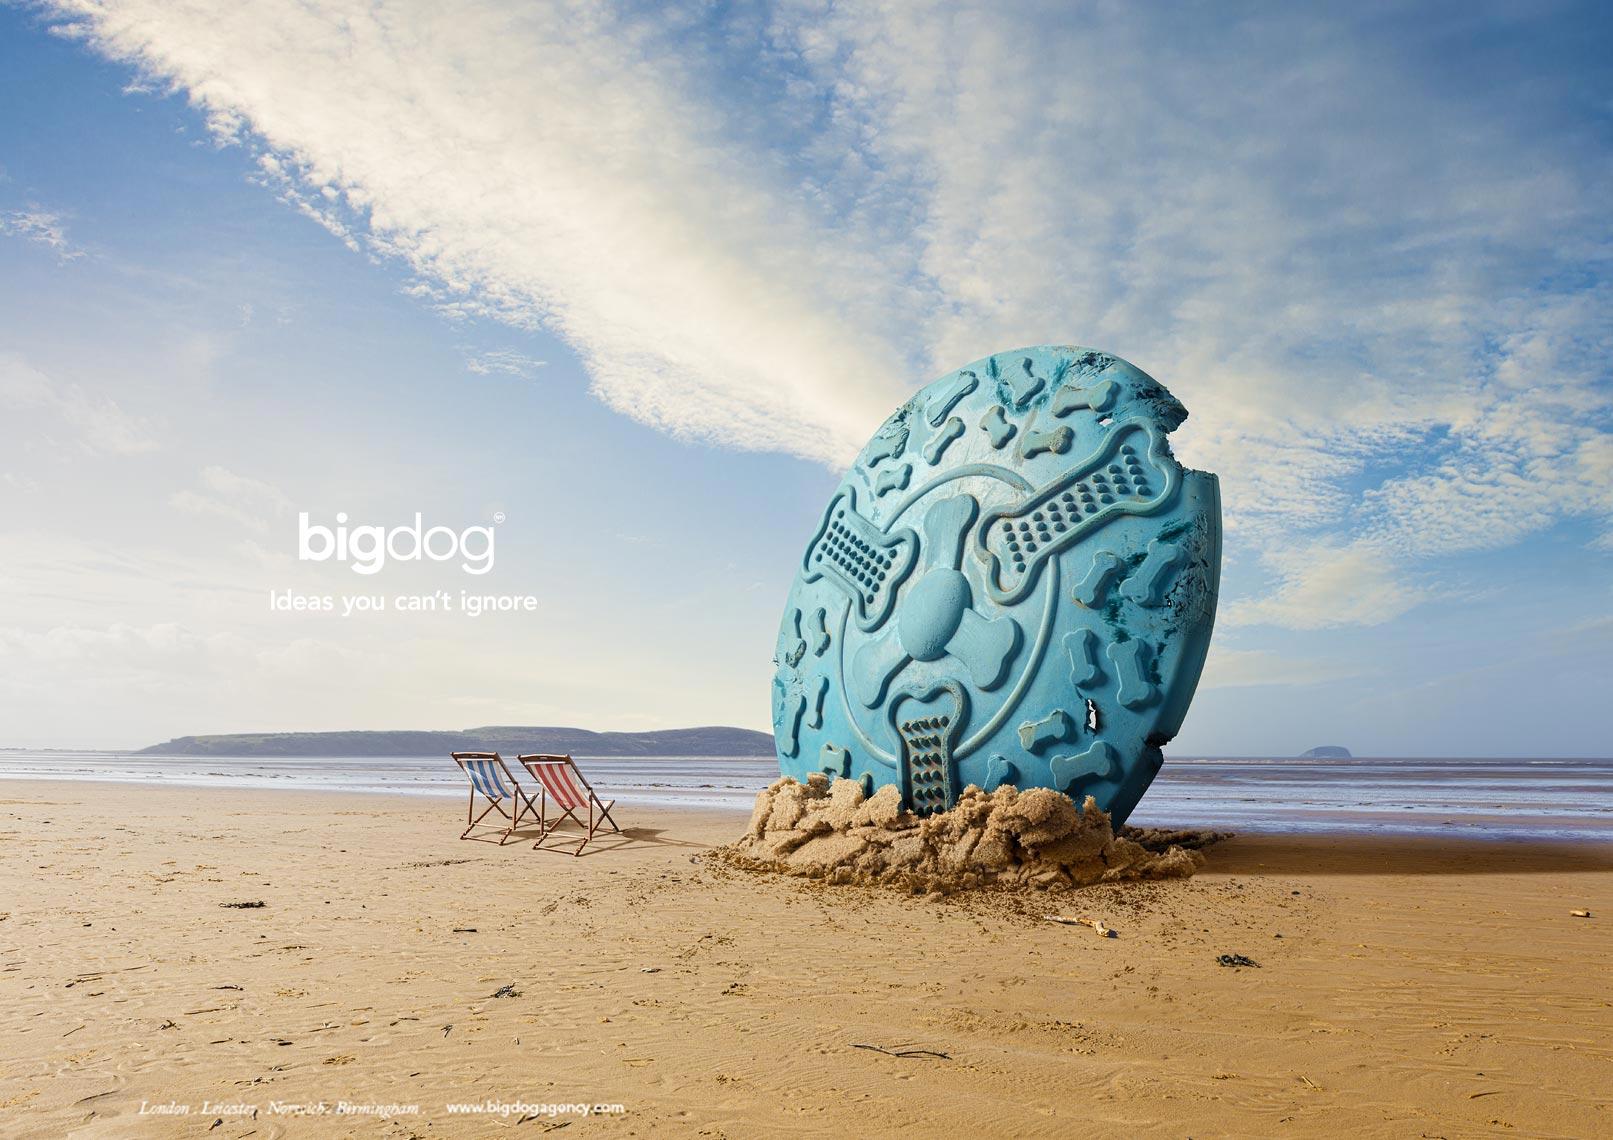 Big Dog - Frisbee